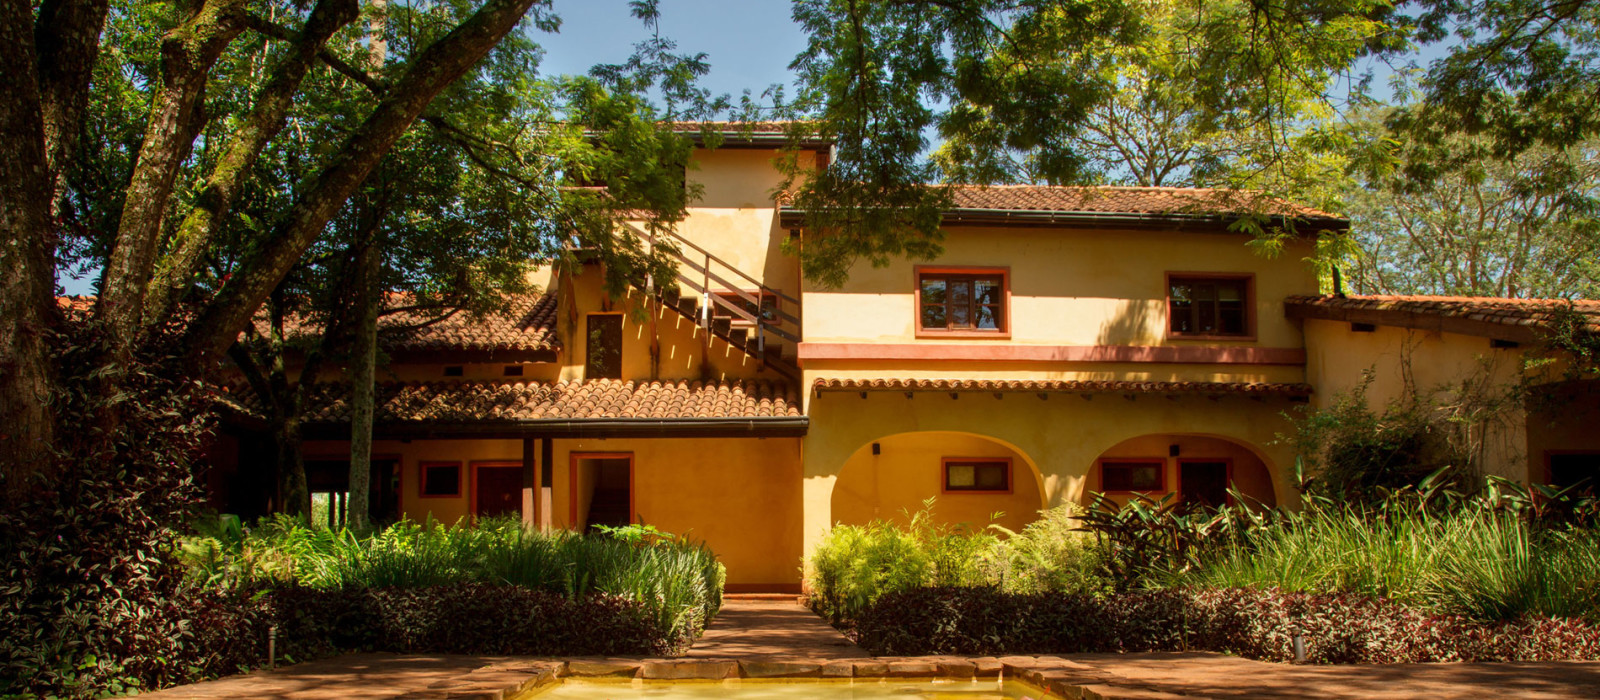 Hotel Puerto Bemberg Lodge Argentina